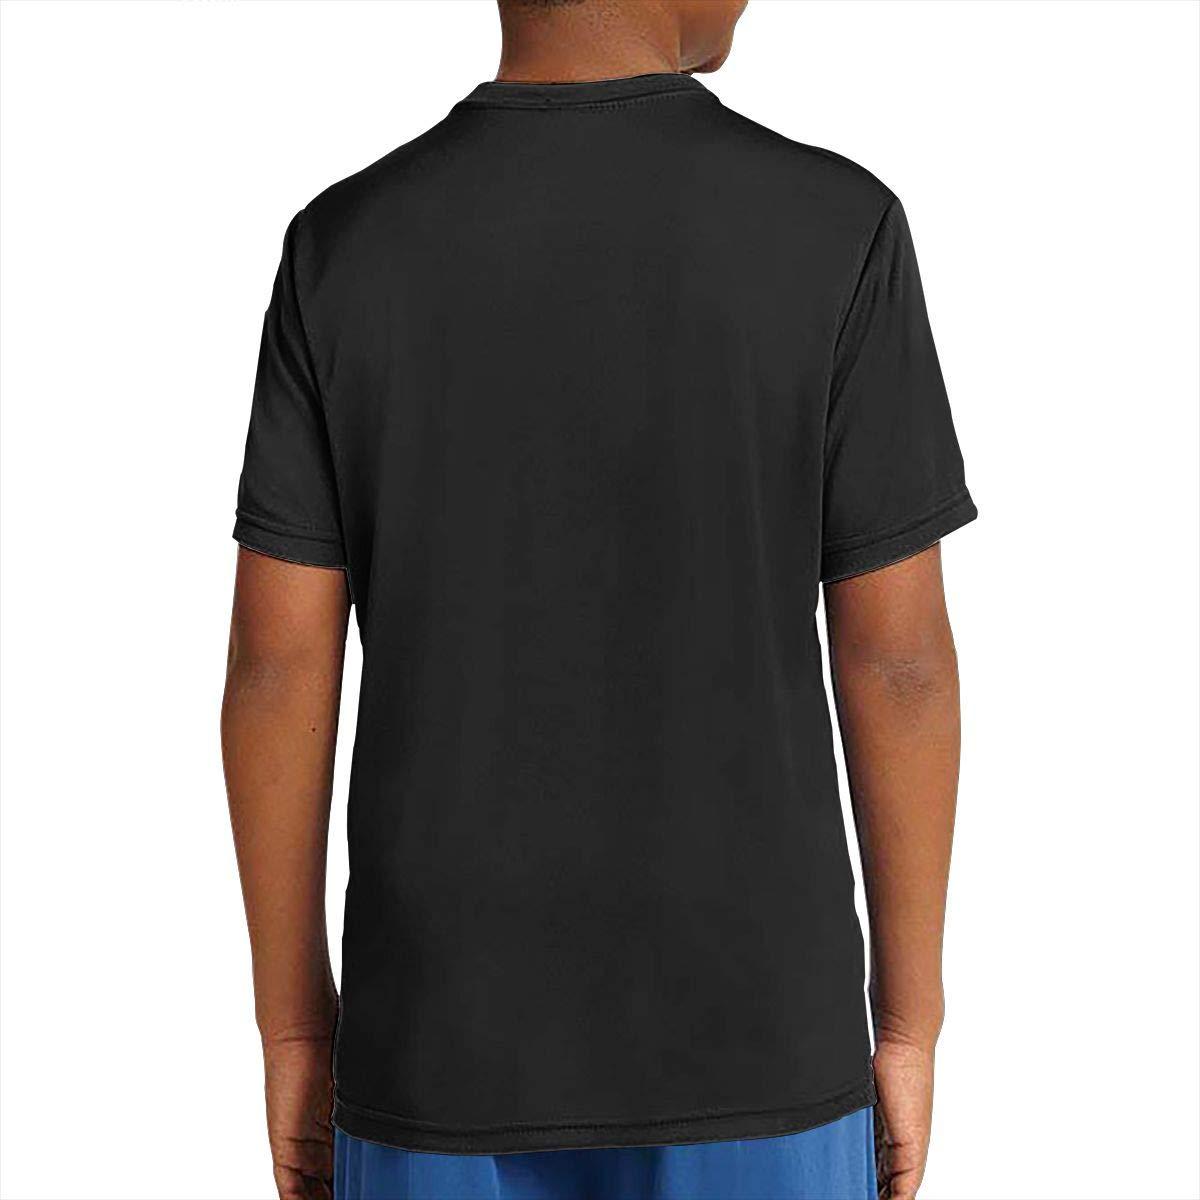 BETHANYJONES Adolescent Boys Girls Short Sleeve Unisex Youth Tees Teenager Tshirt Black